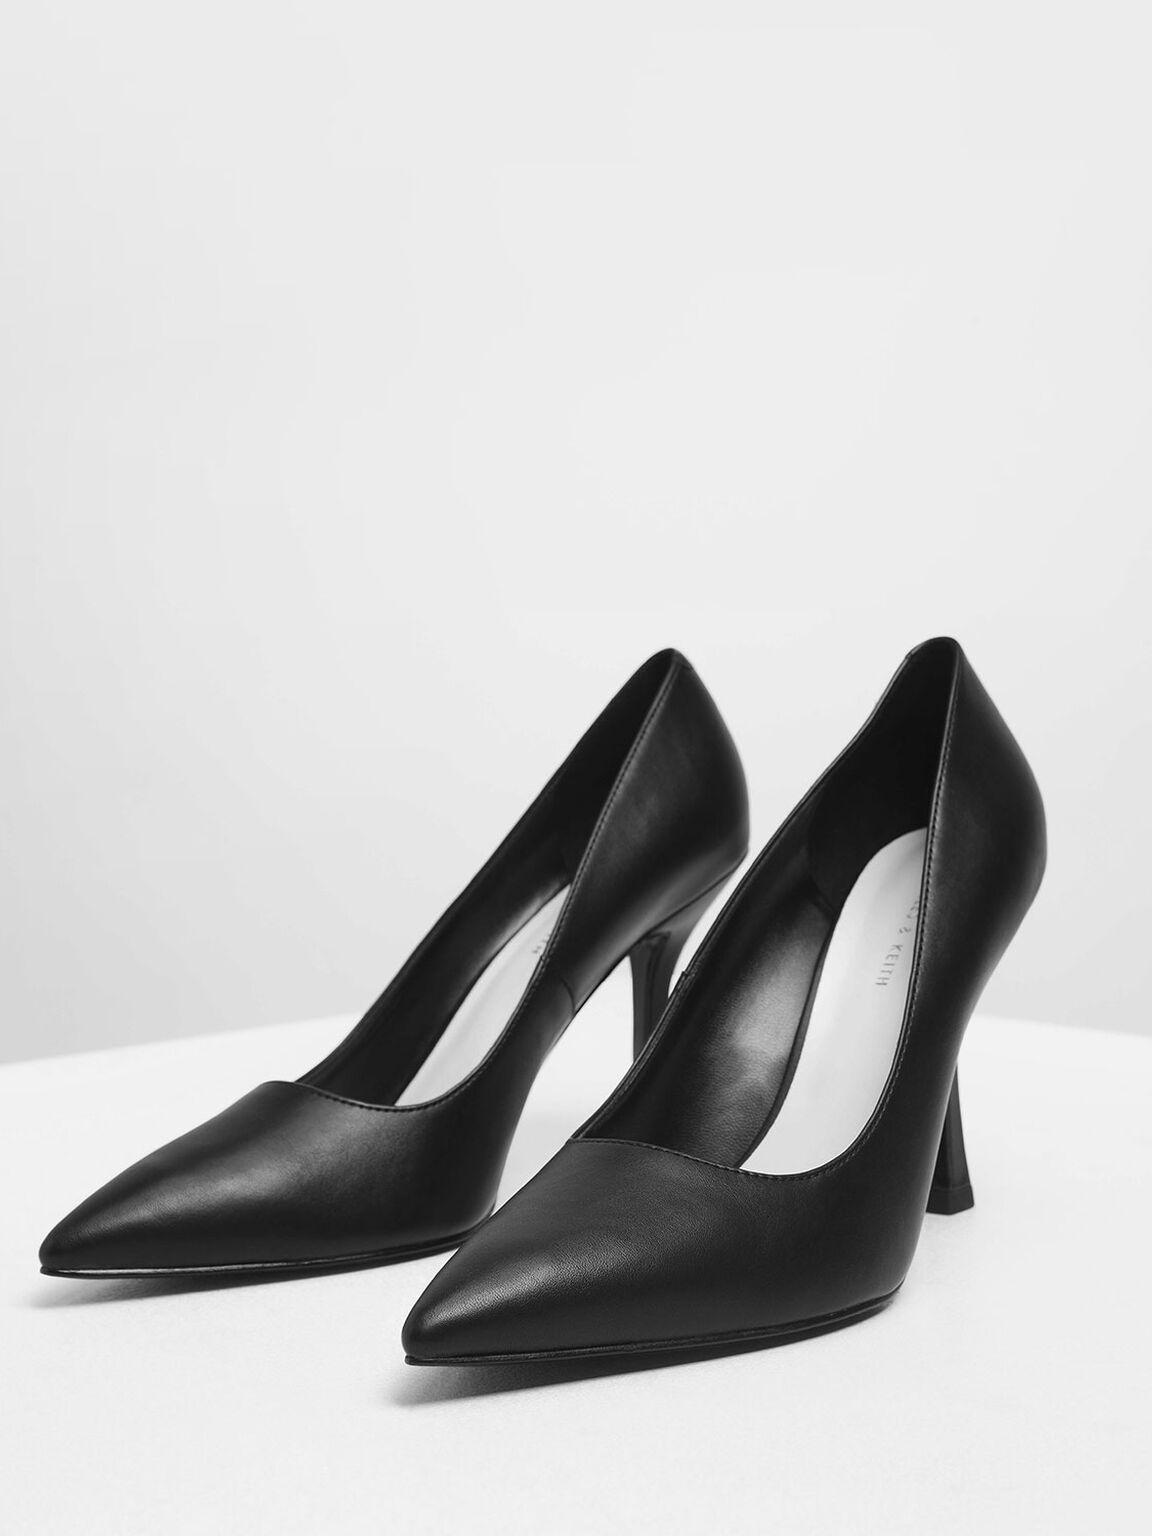 Curved Stiletto Heel Pumps, Black, hi-res